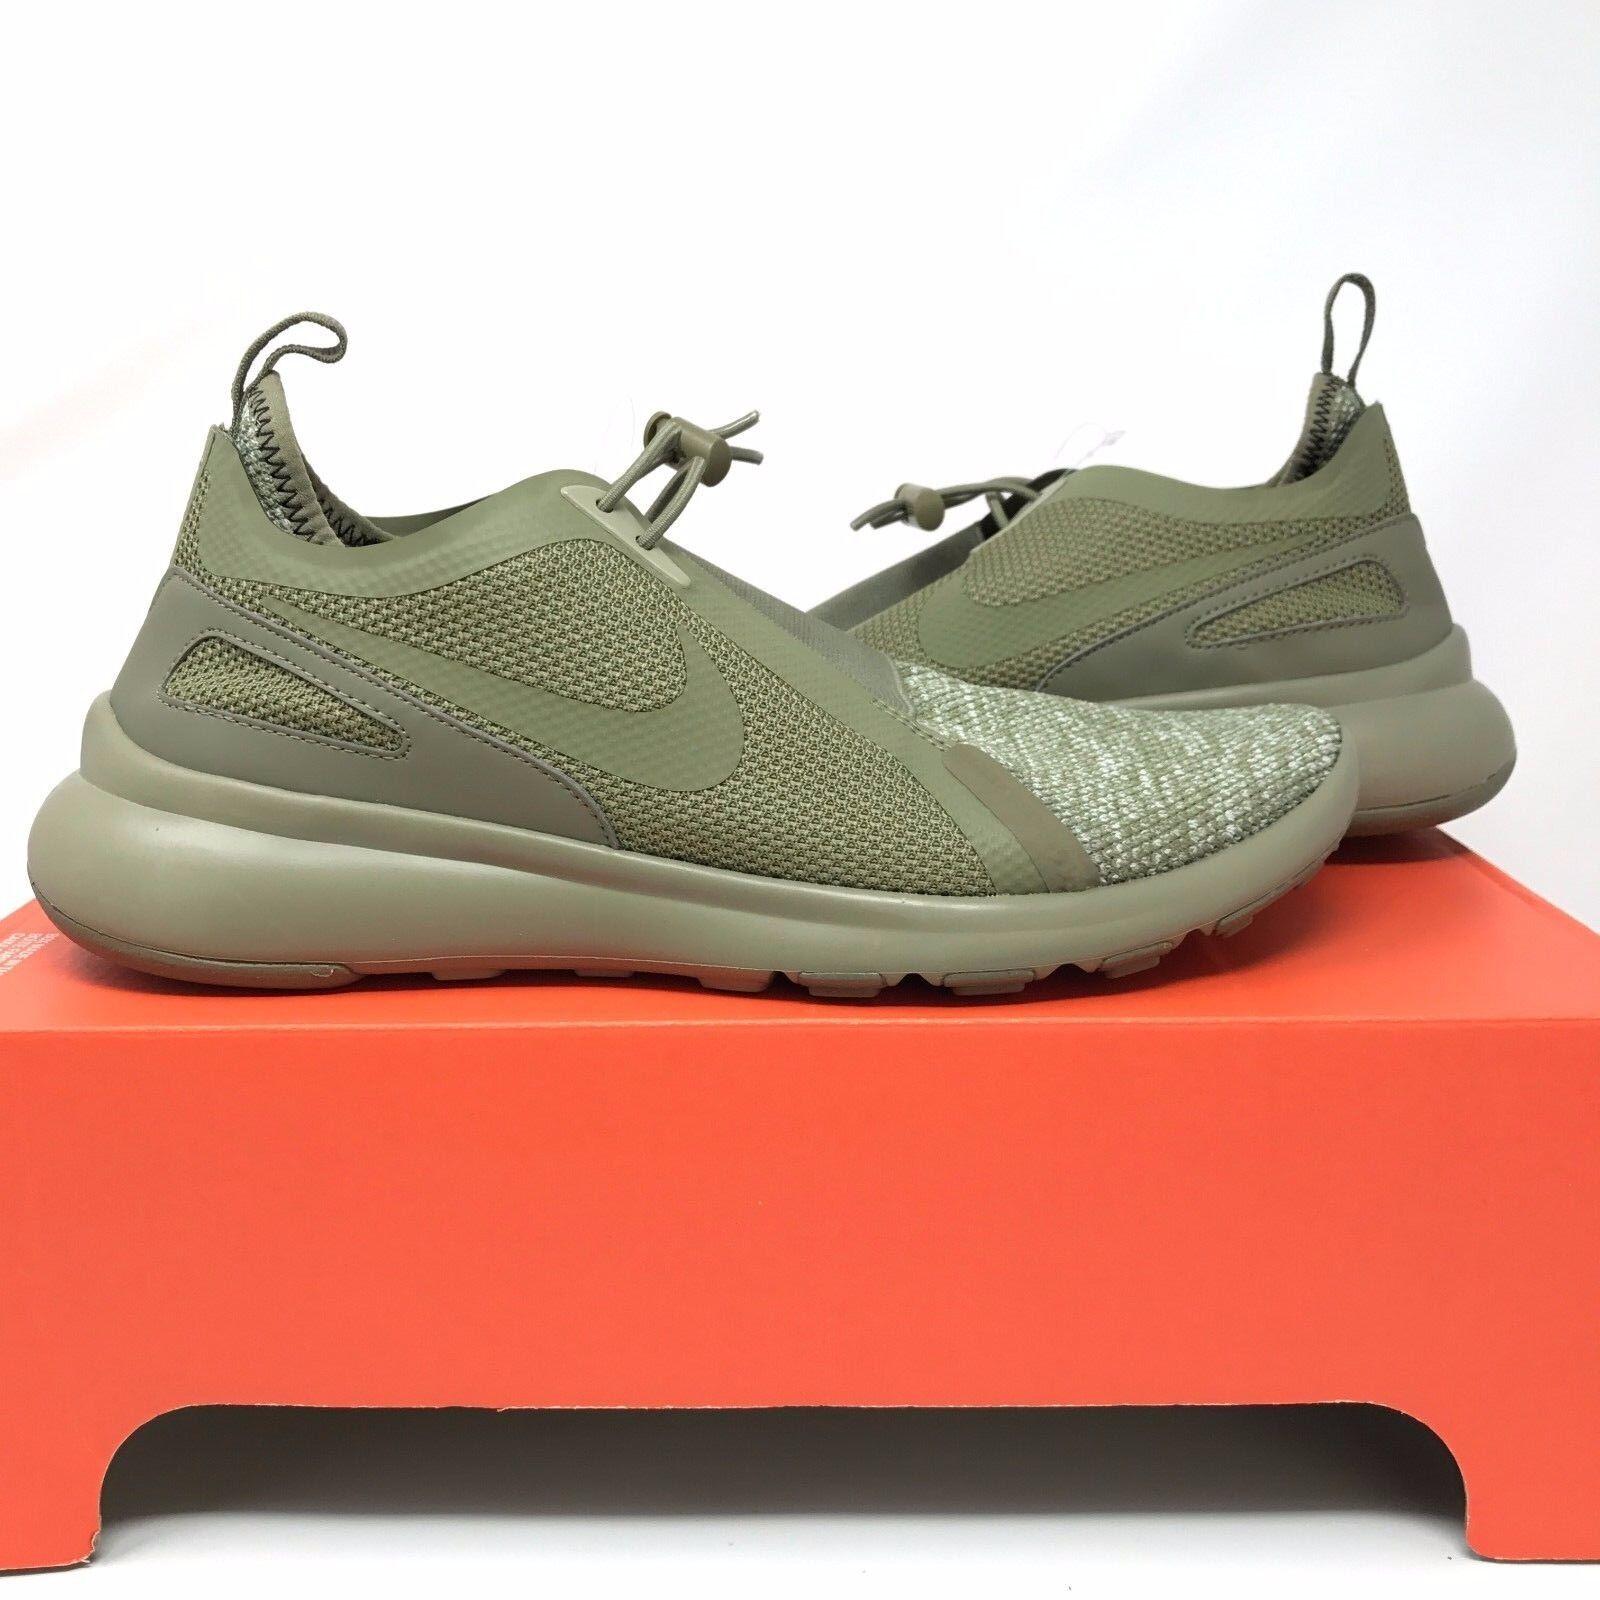 Nike Current Slip On BR Olive 903895-200 - Breathe Dart Presto Flyknit Tech Sock